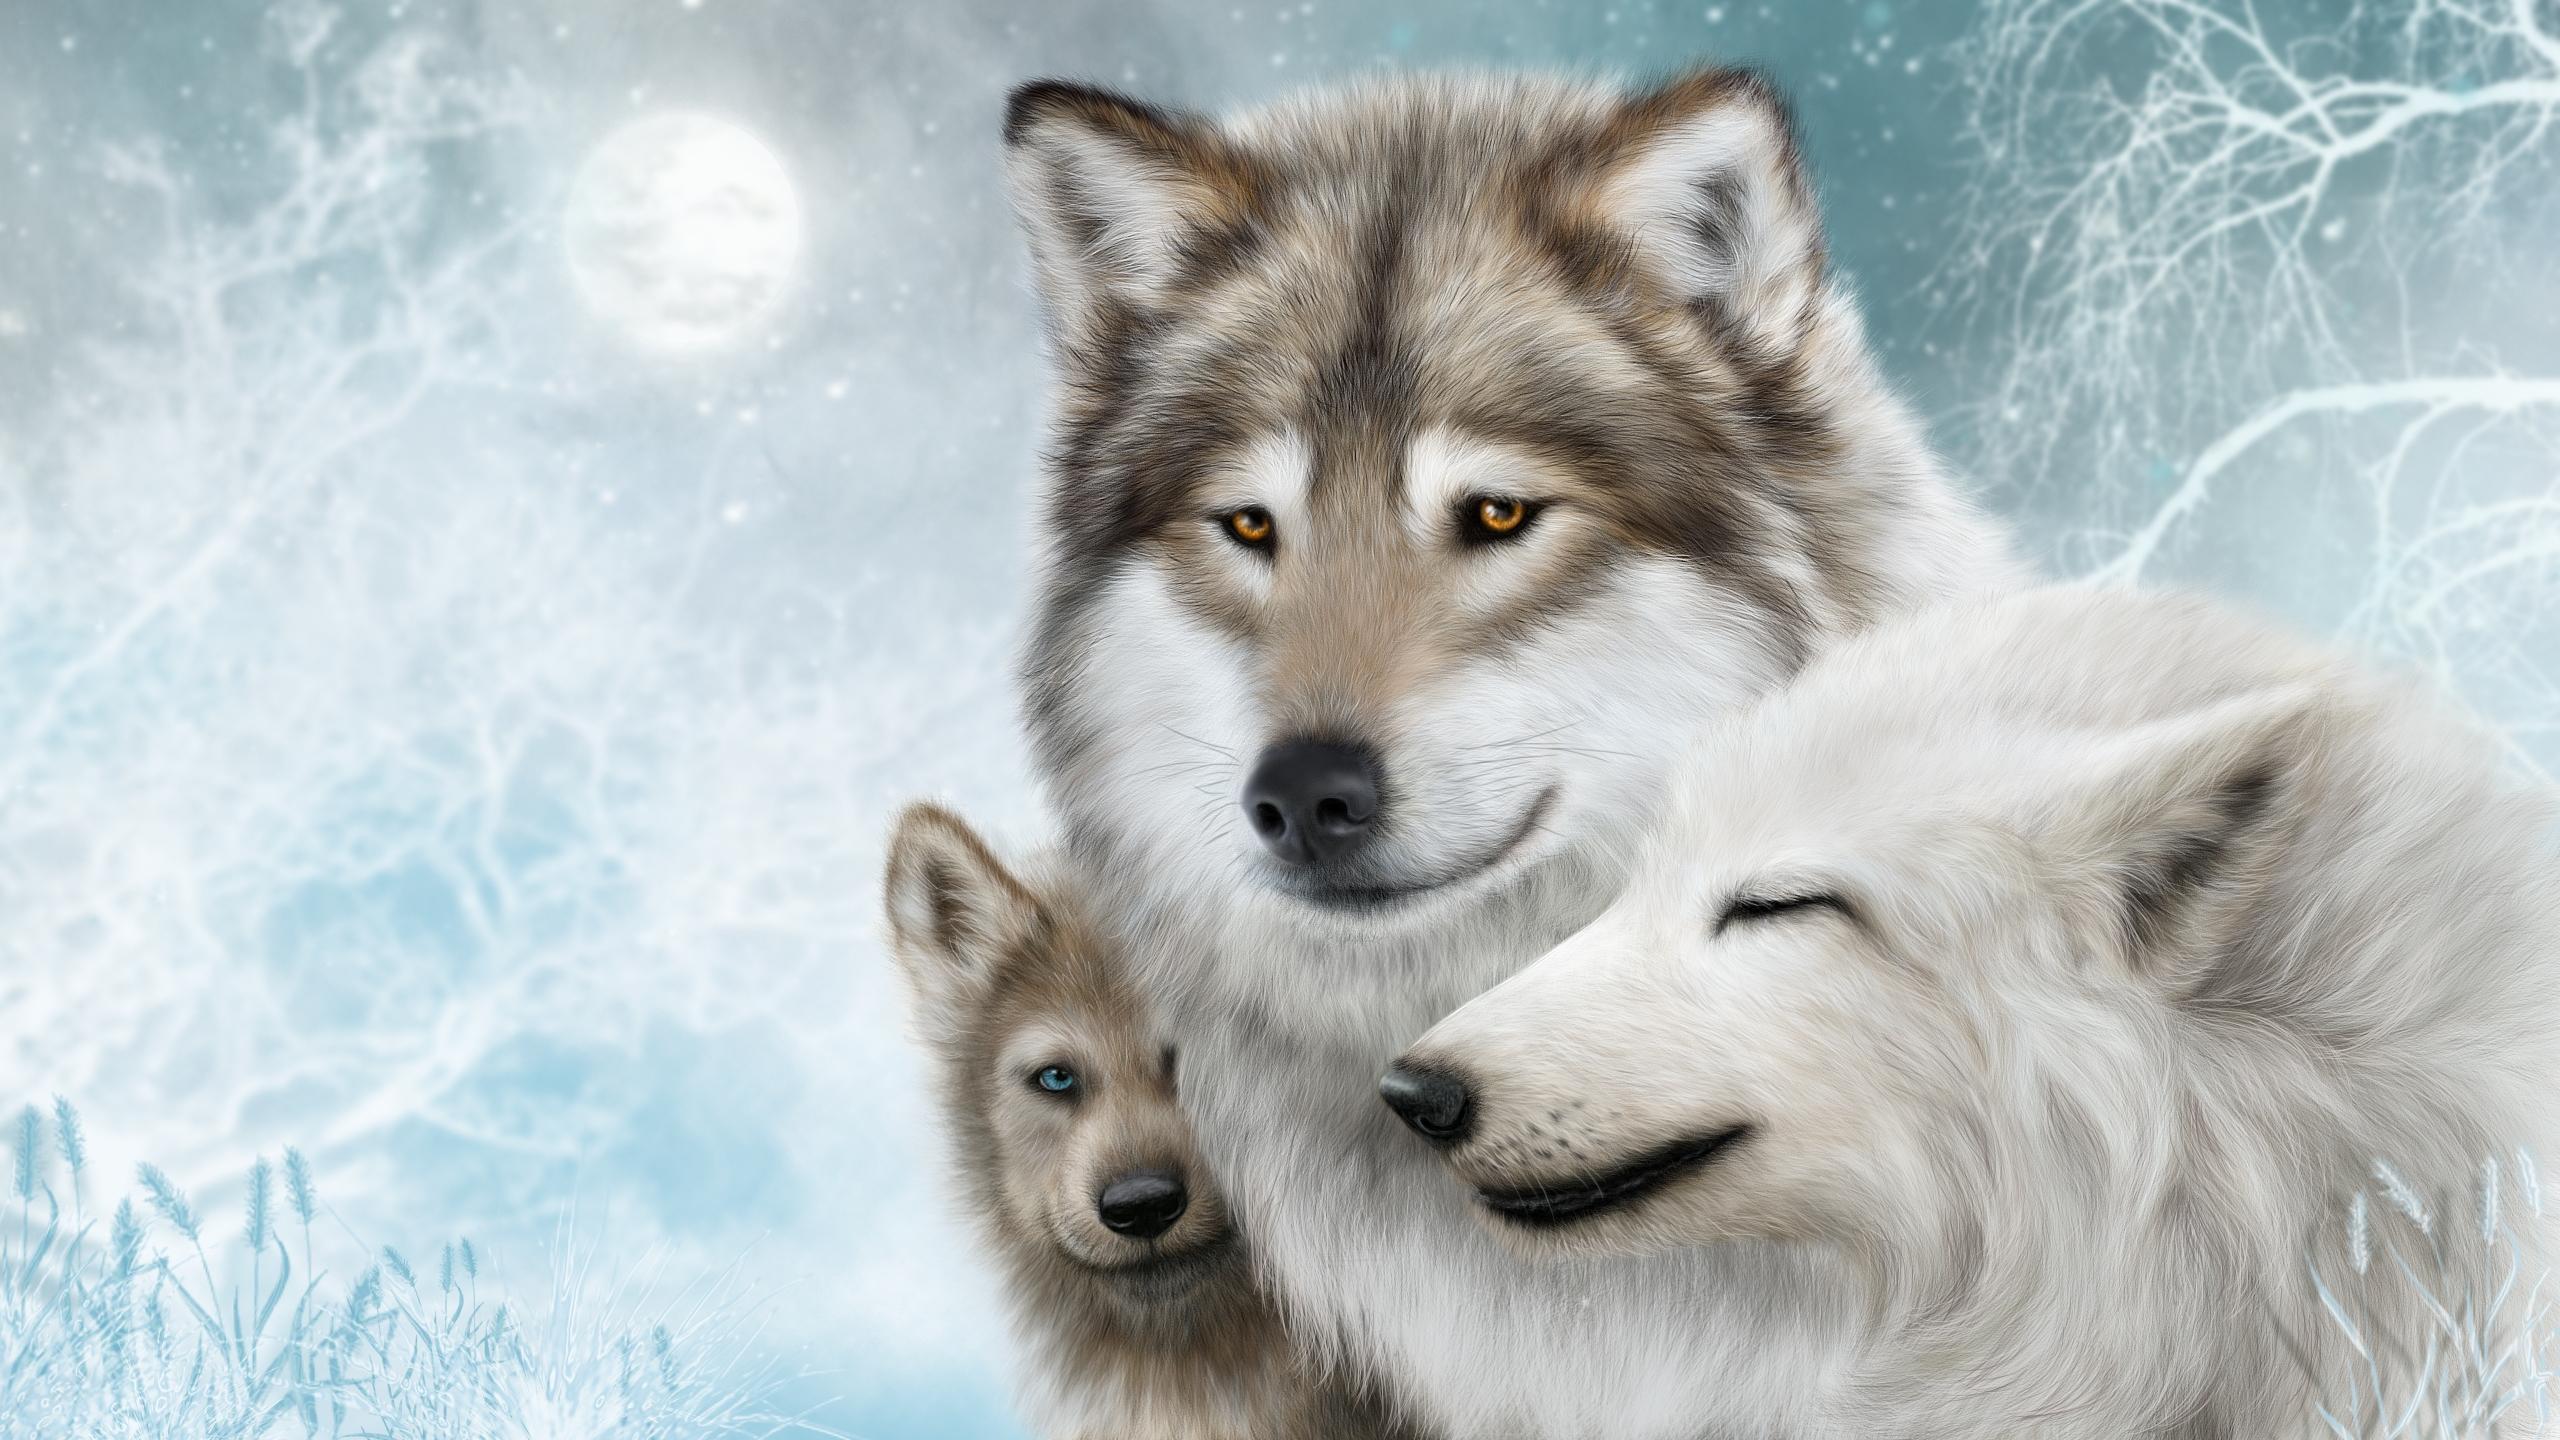 Nevada Wolf Pack Wallpaper: Wolf Painting Fondo De Pantalla HD